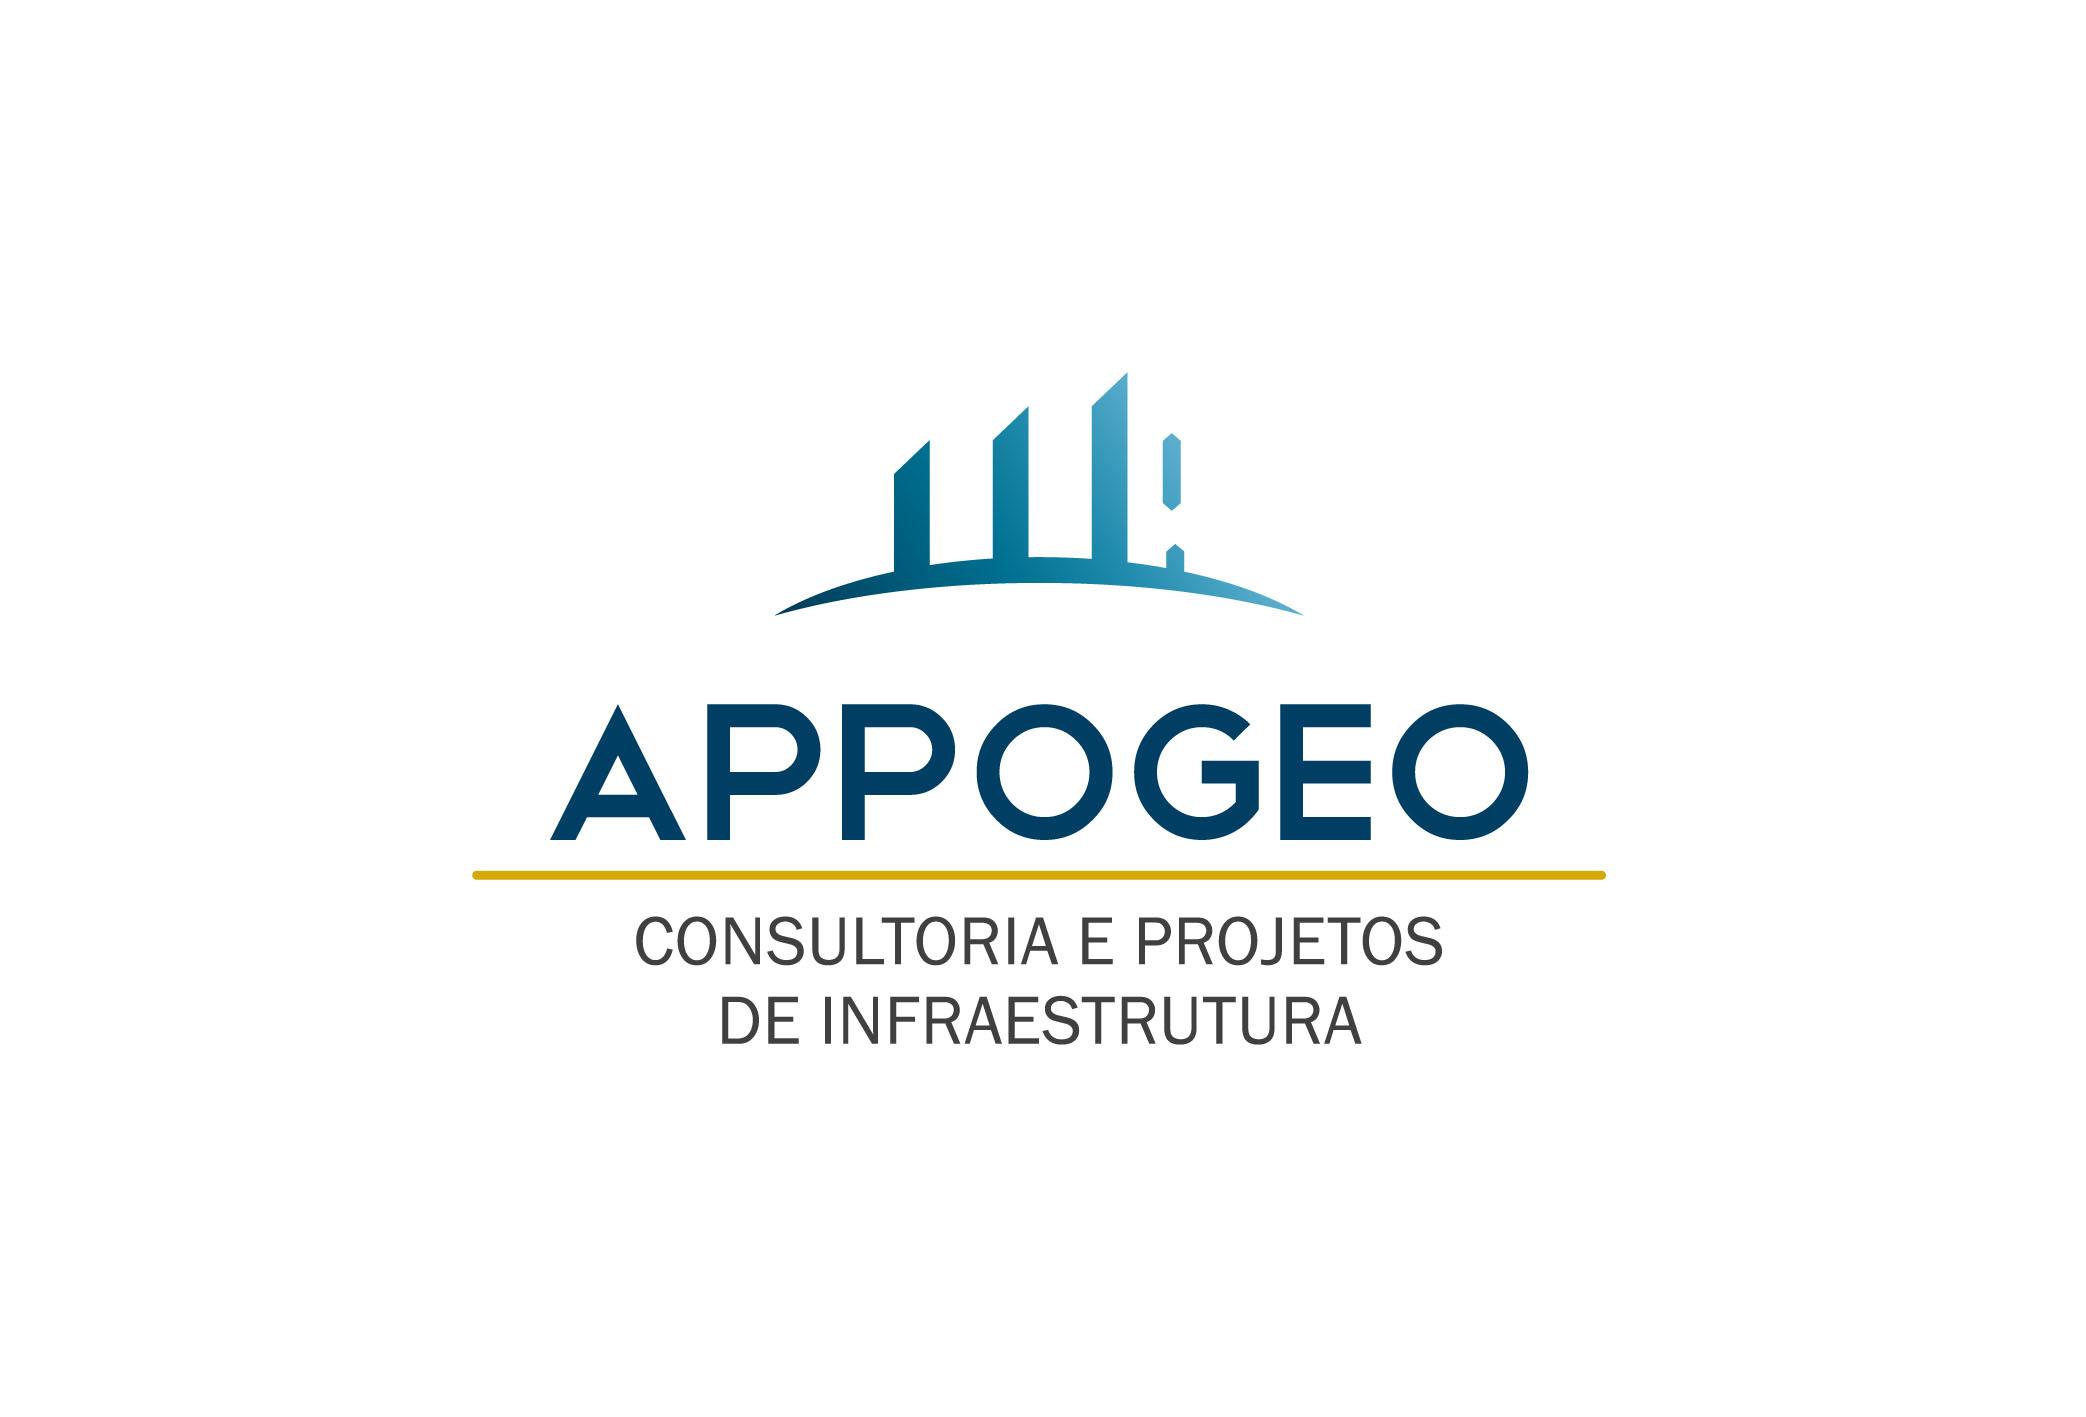 appogeo-02-logo-01-b